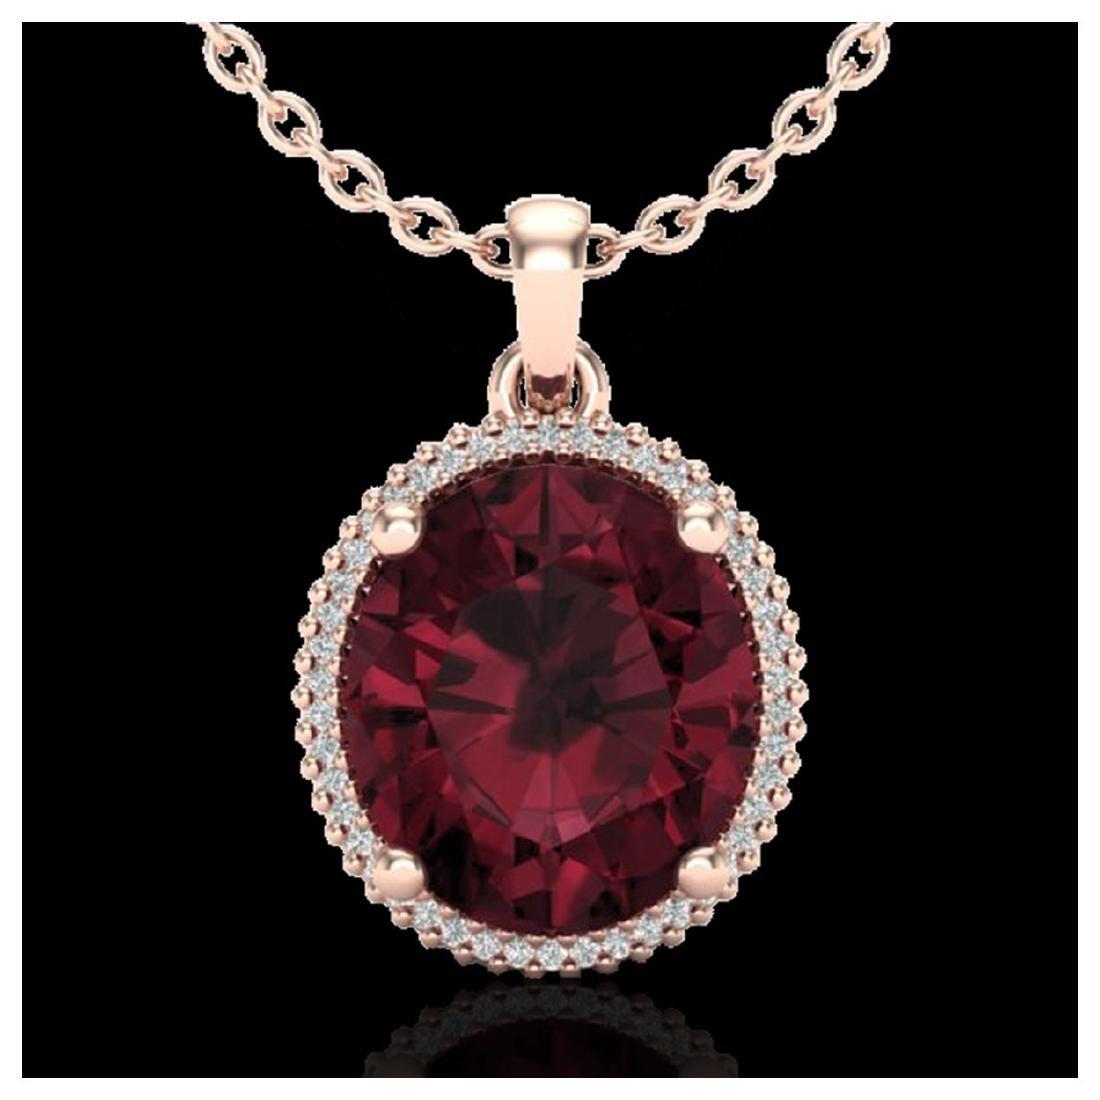 11 ctw Garnet & VS/SI Diamond Necklace 14K Rose Gold -